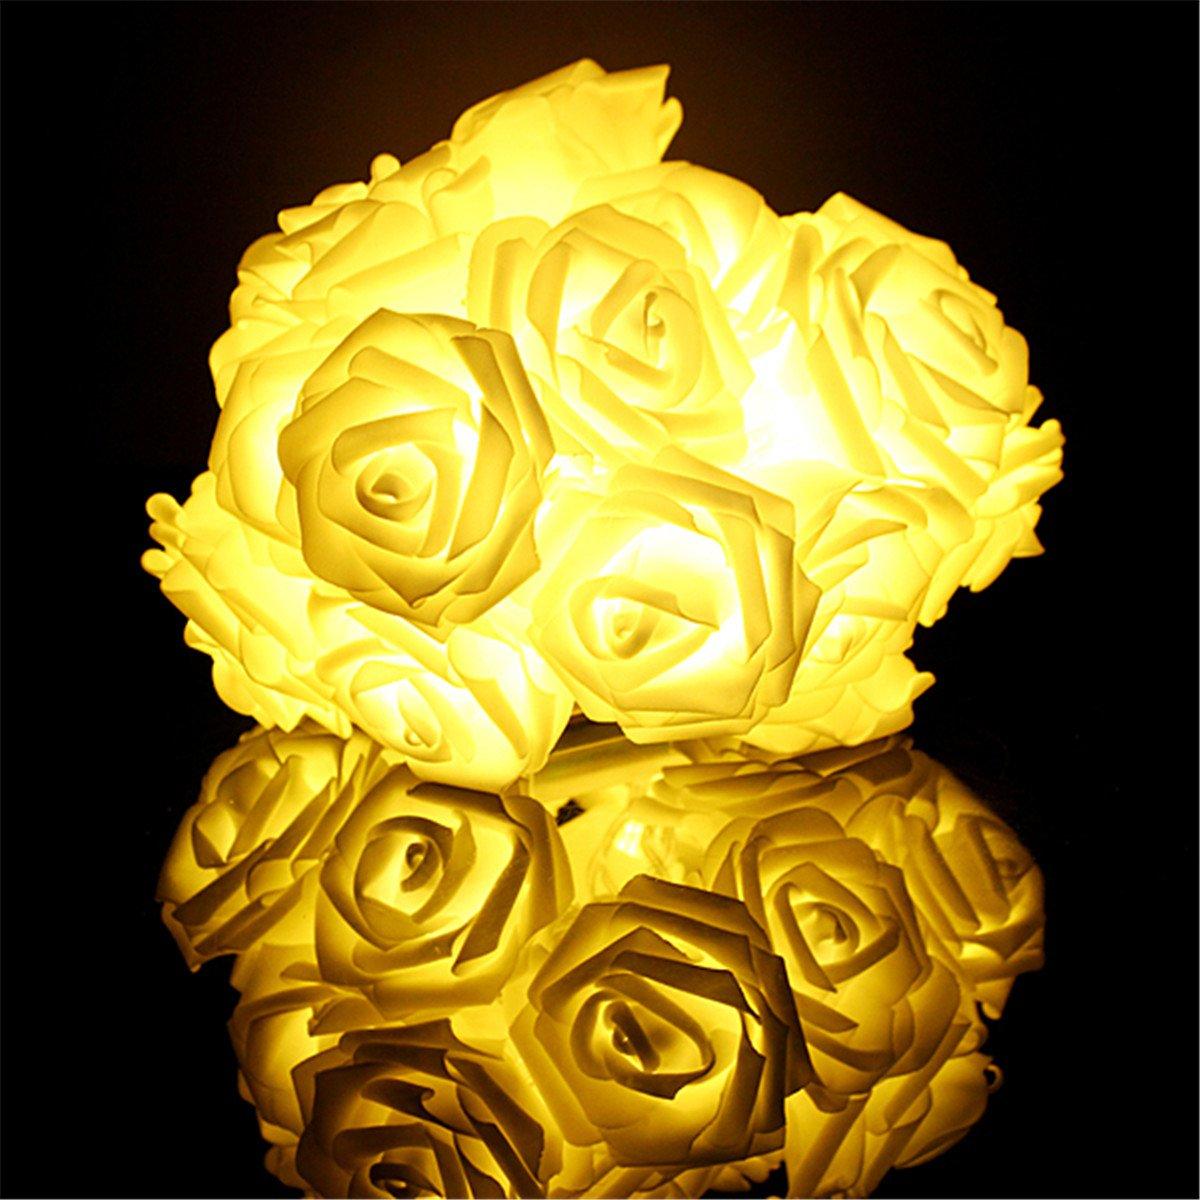 Amazon.com: KINGSO 20 LED Battery Operated Rose Flower String Lights ...